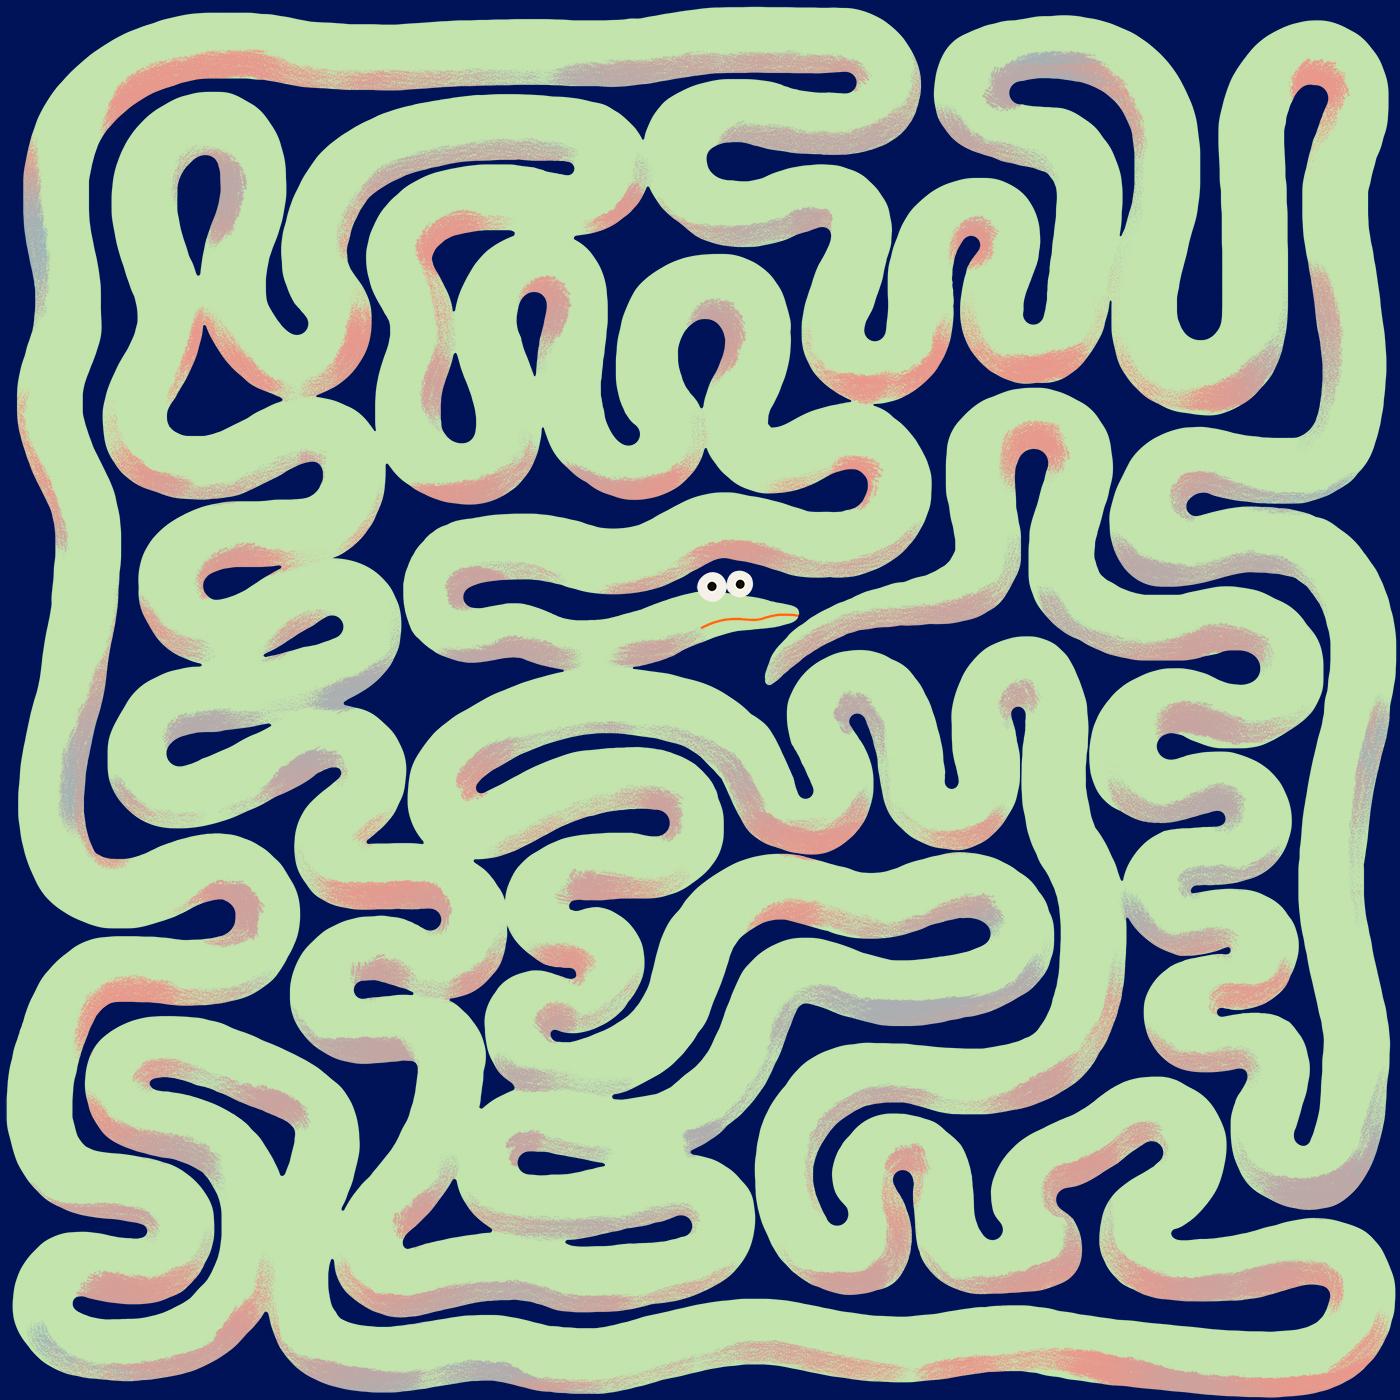 Diutissime-Serpentinouze-Labyrinthus